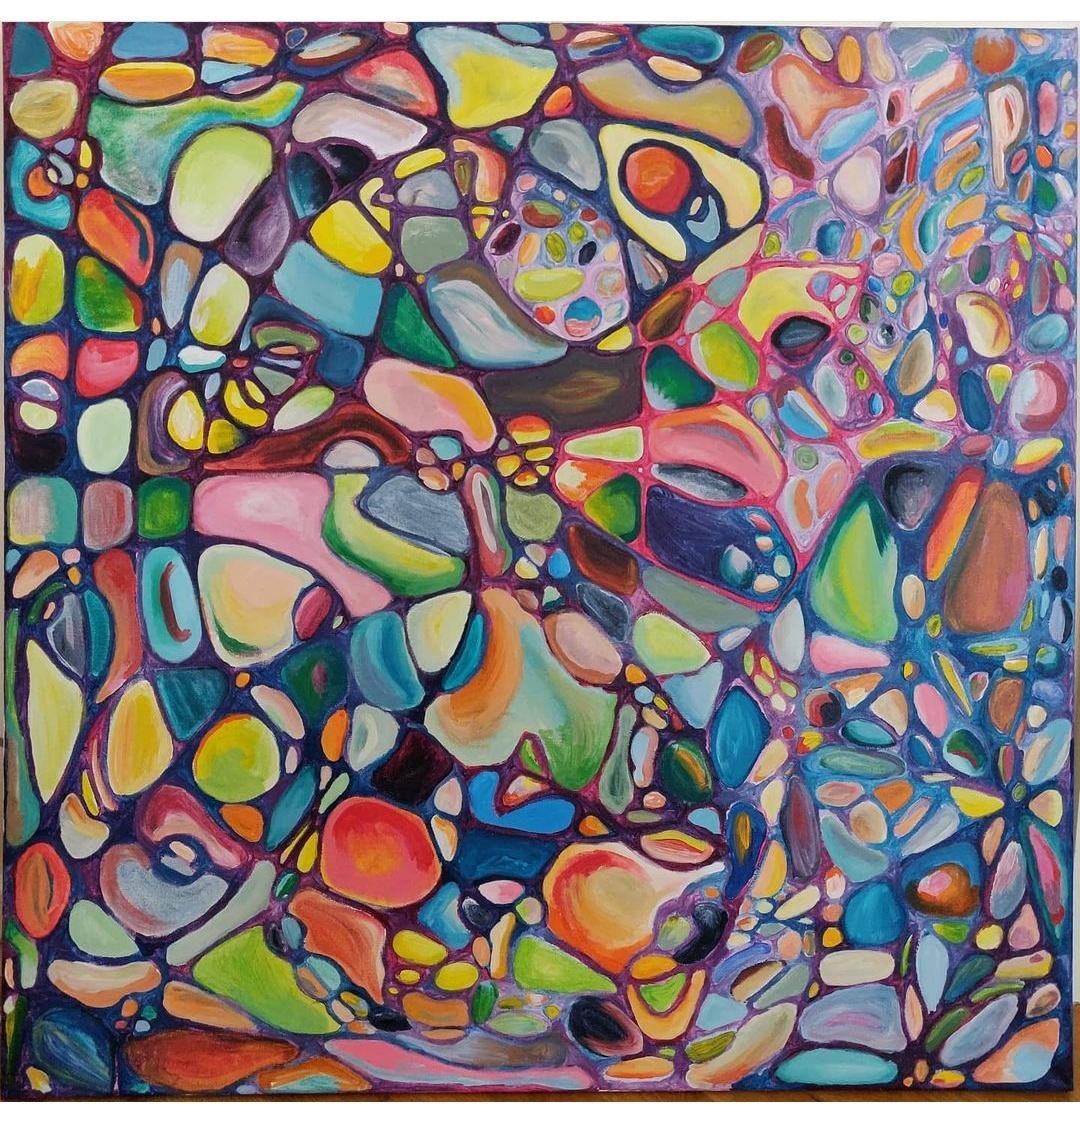 Simone Hauptmann, Labyrint 80x80 cm